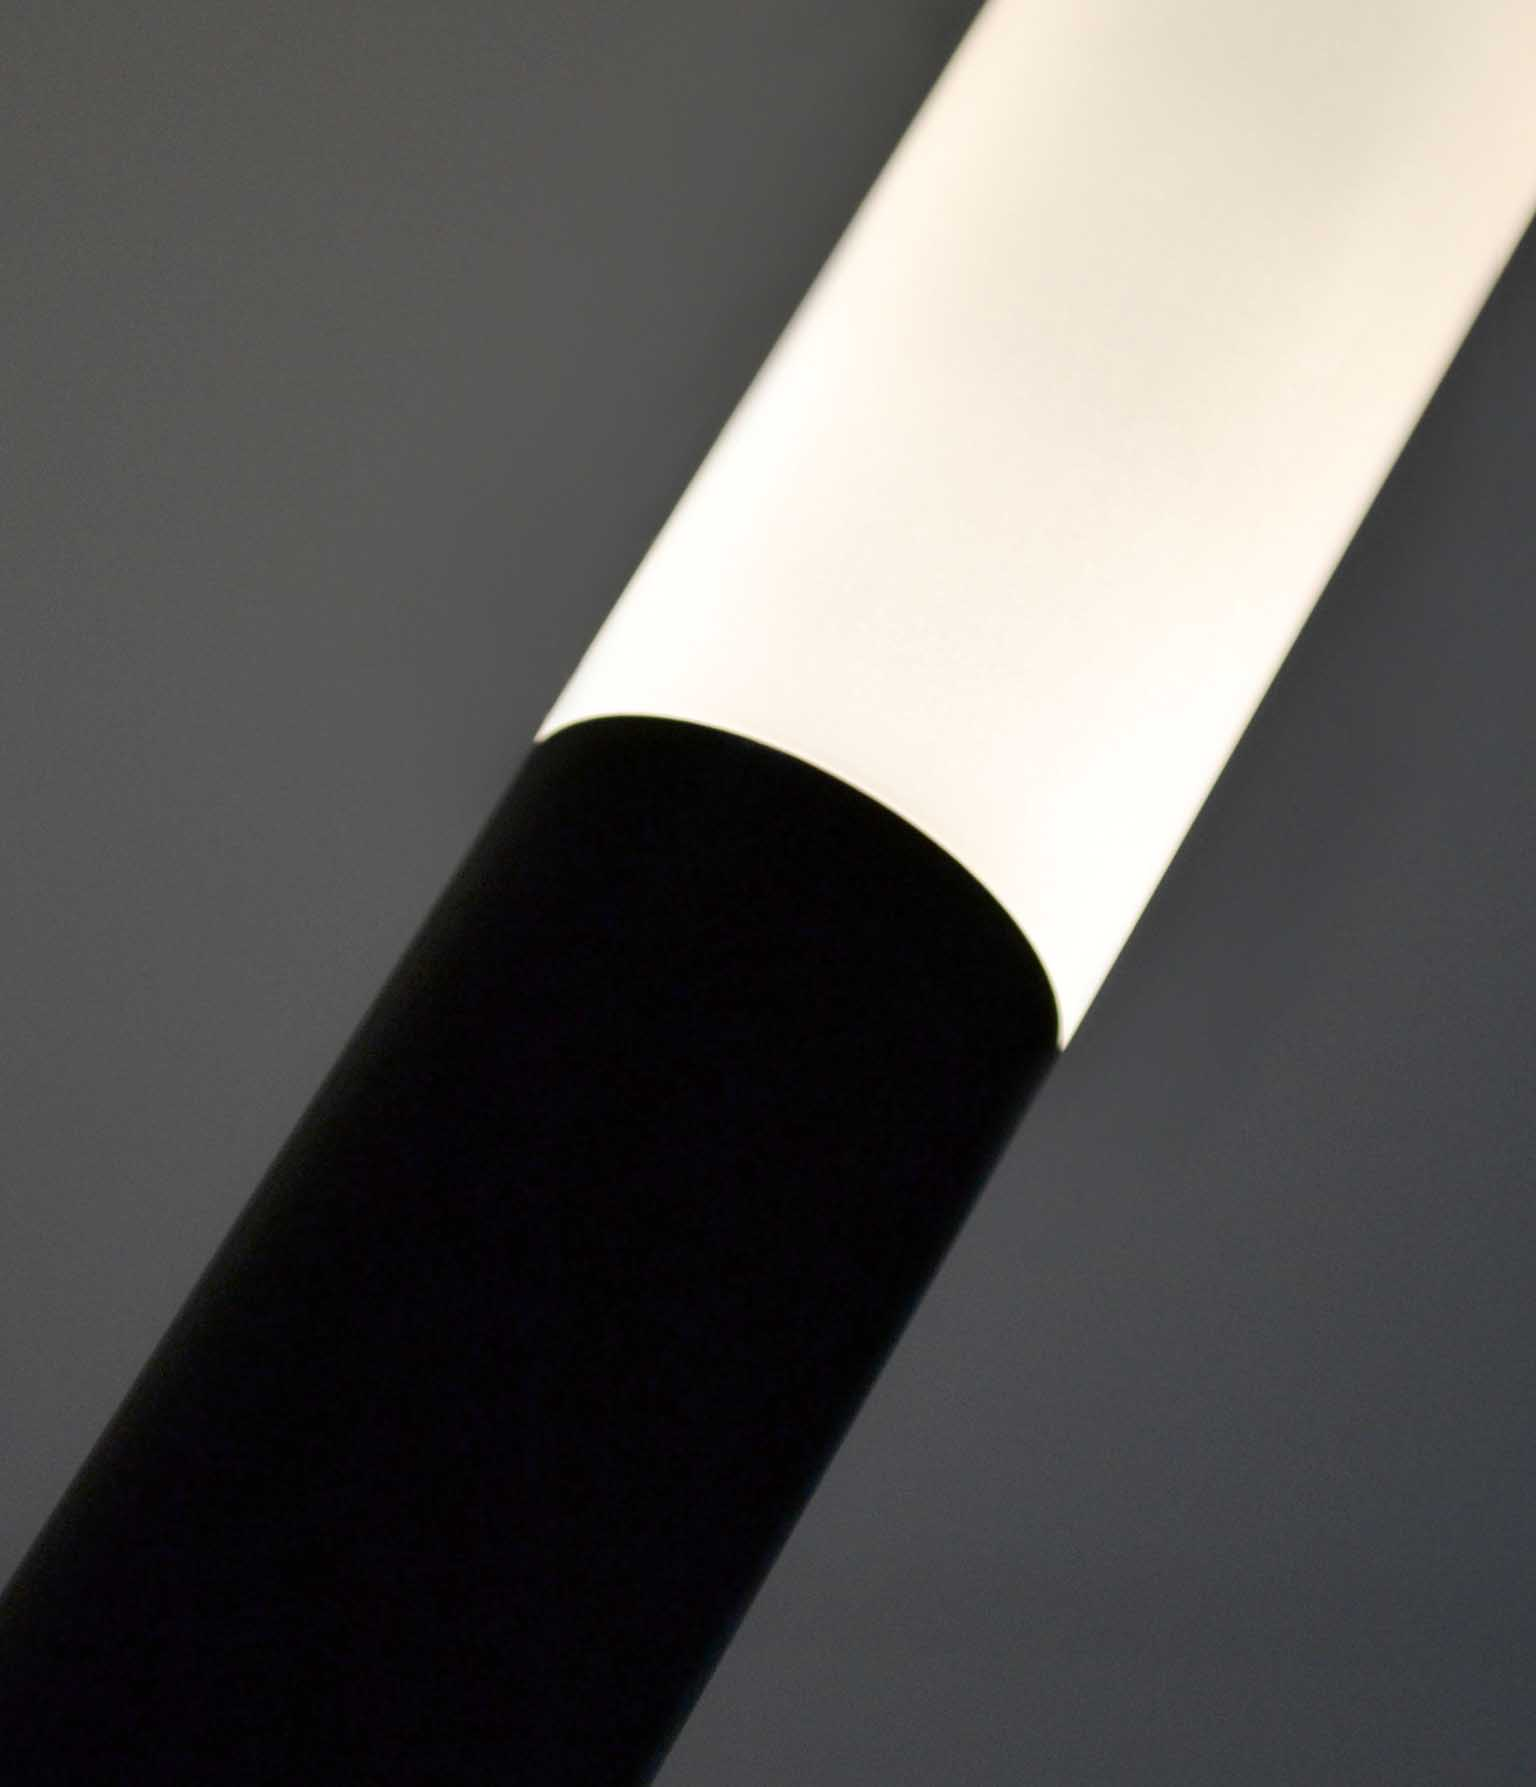 Custom Design Sleek Pendant Light Frosted Acrylic Baton LED Matt Black Component Nulty Bespoke